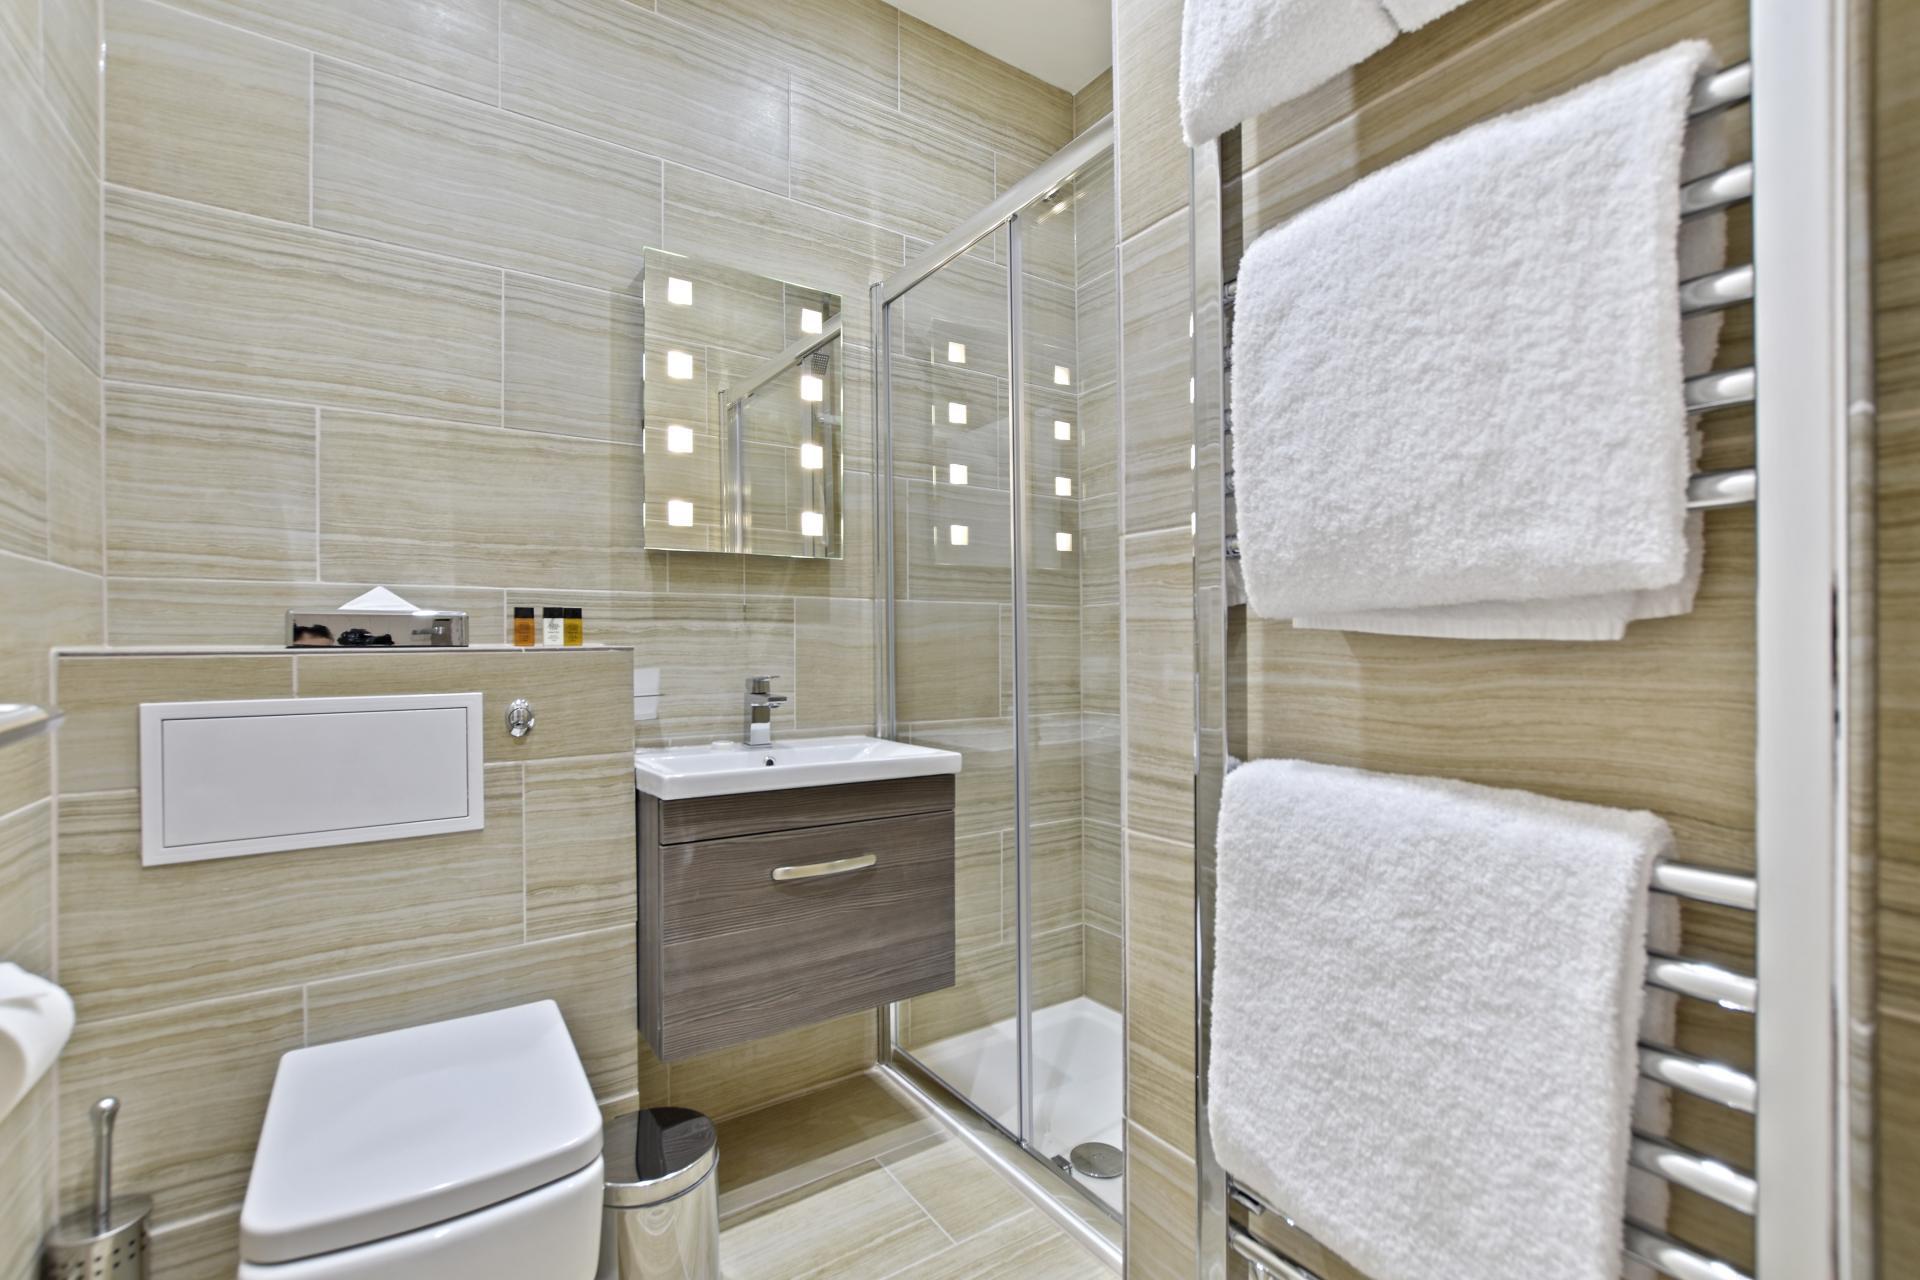 Bathroom at Leinster Square by Bridgestreet, Bayswater, London - Citybase Apartments